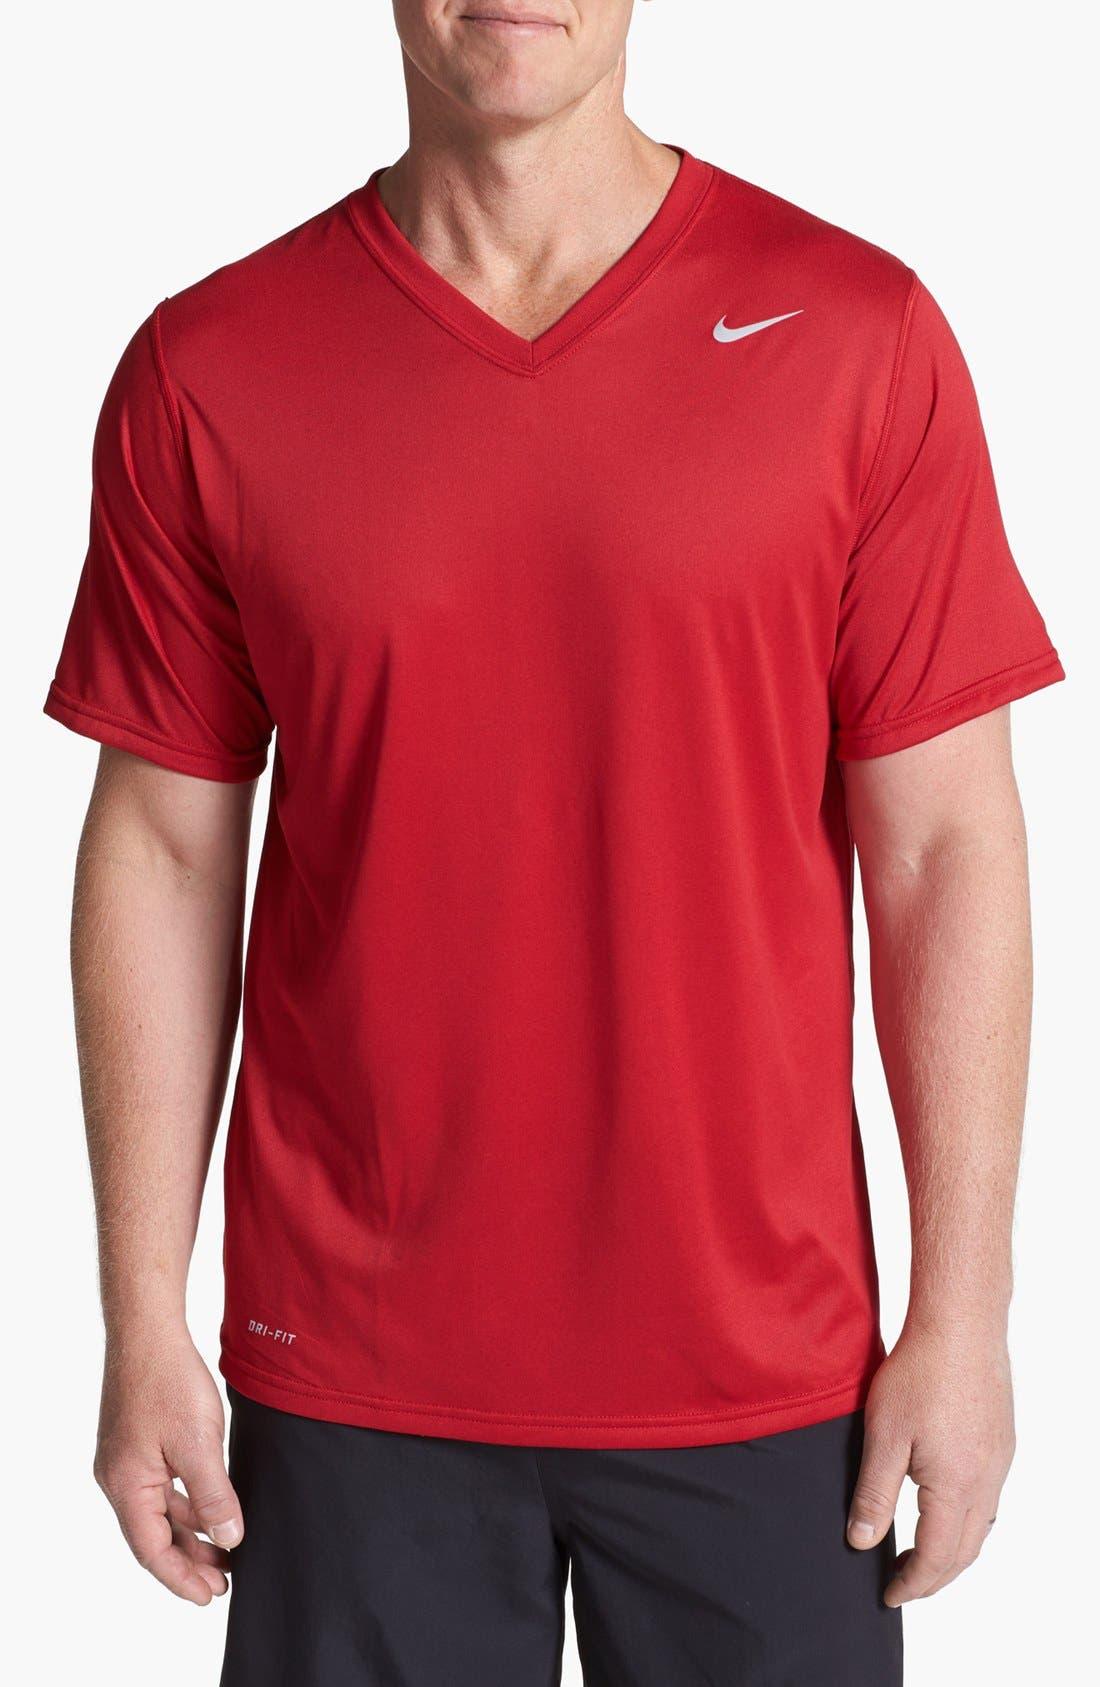 Alternate Image 1 Selected - Nike 'Legend' Dri-FIT V-Neck T-Shirt